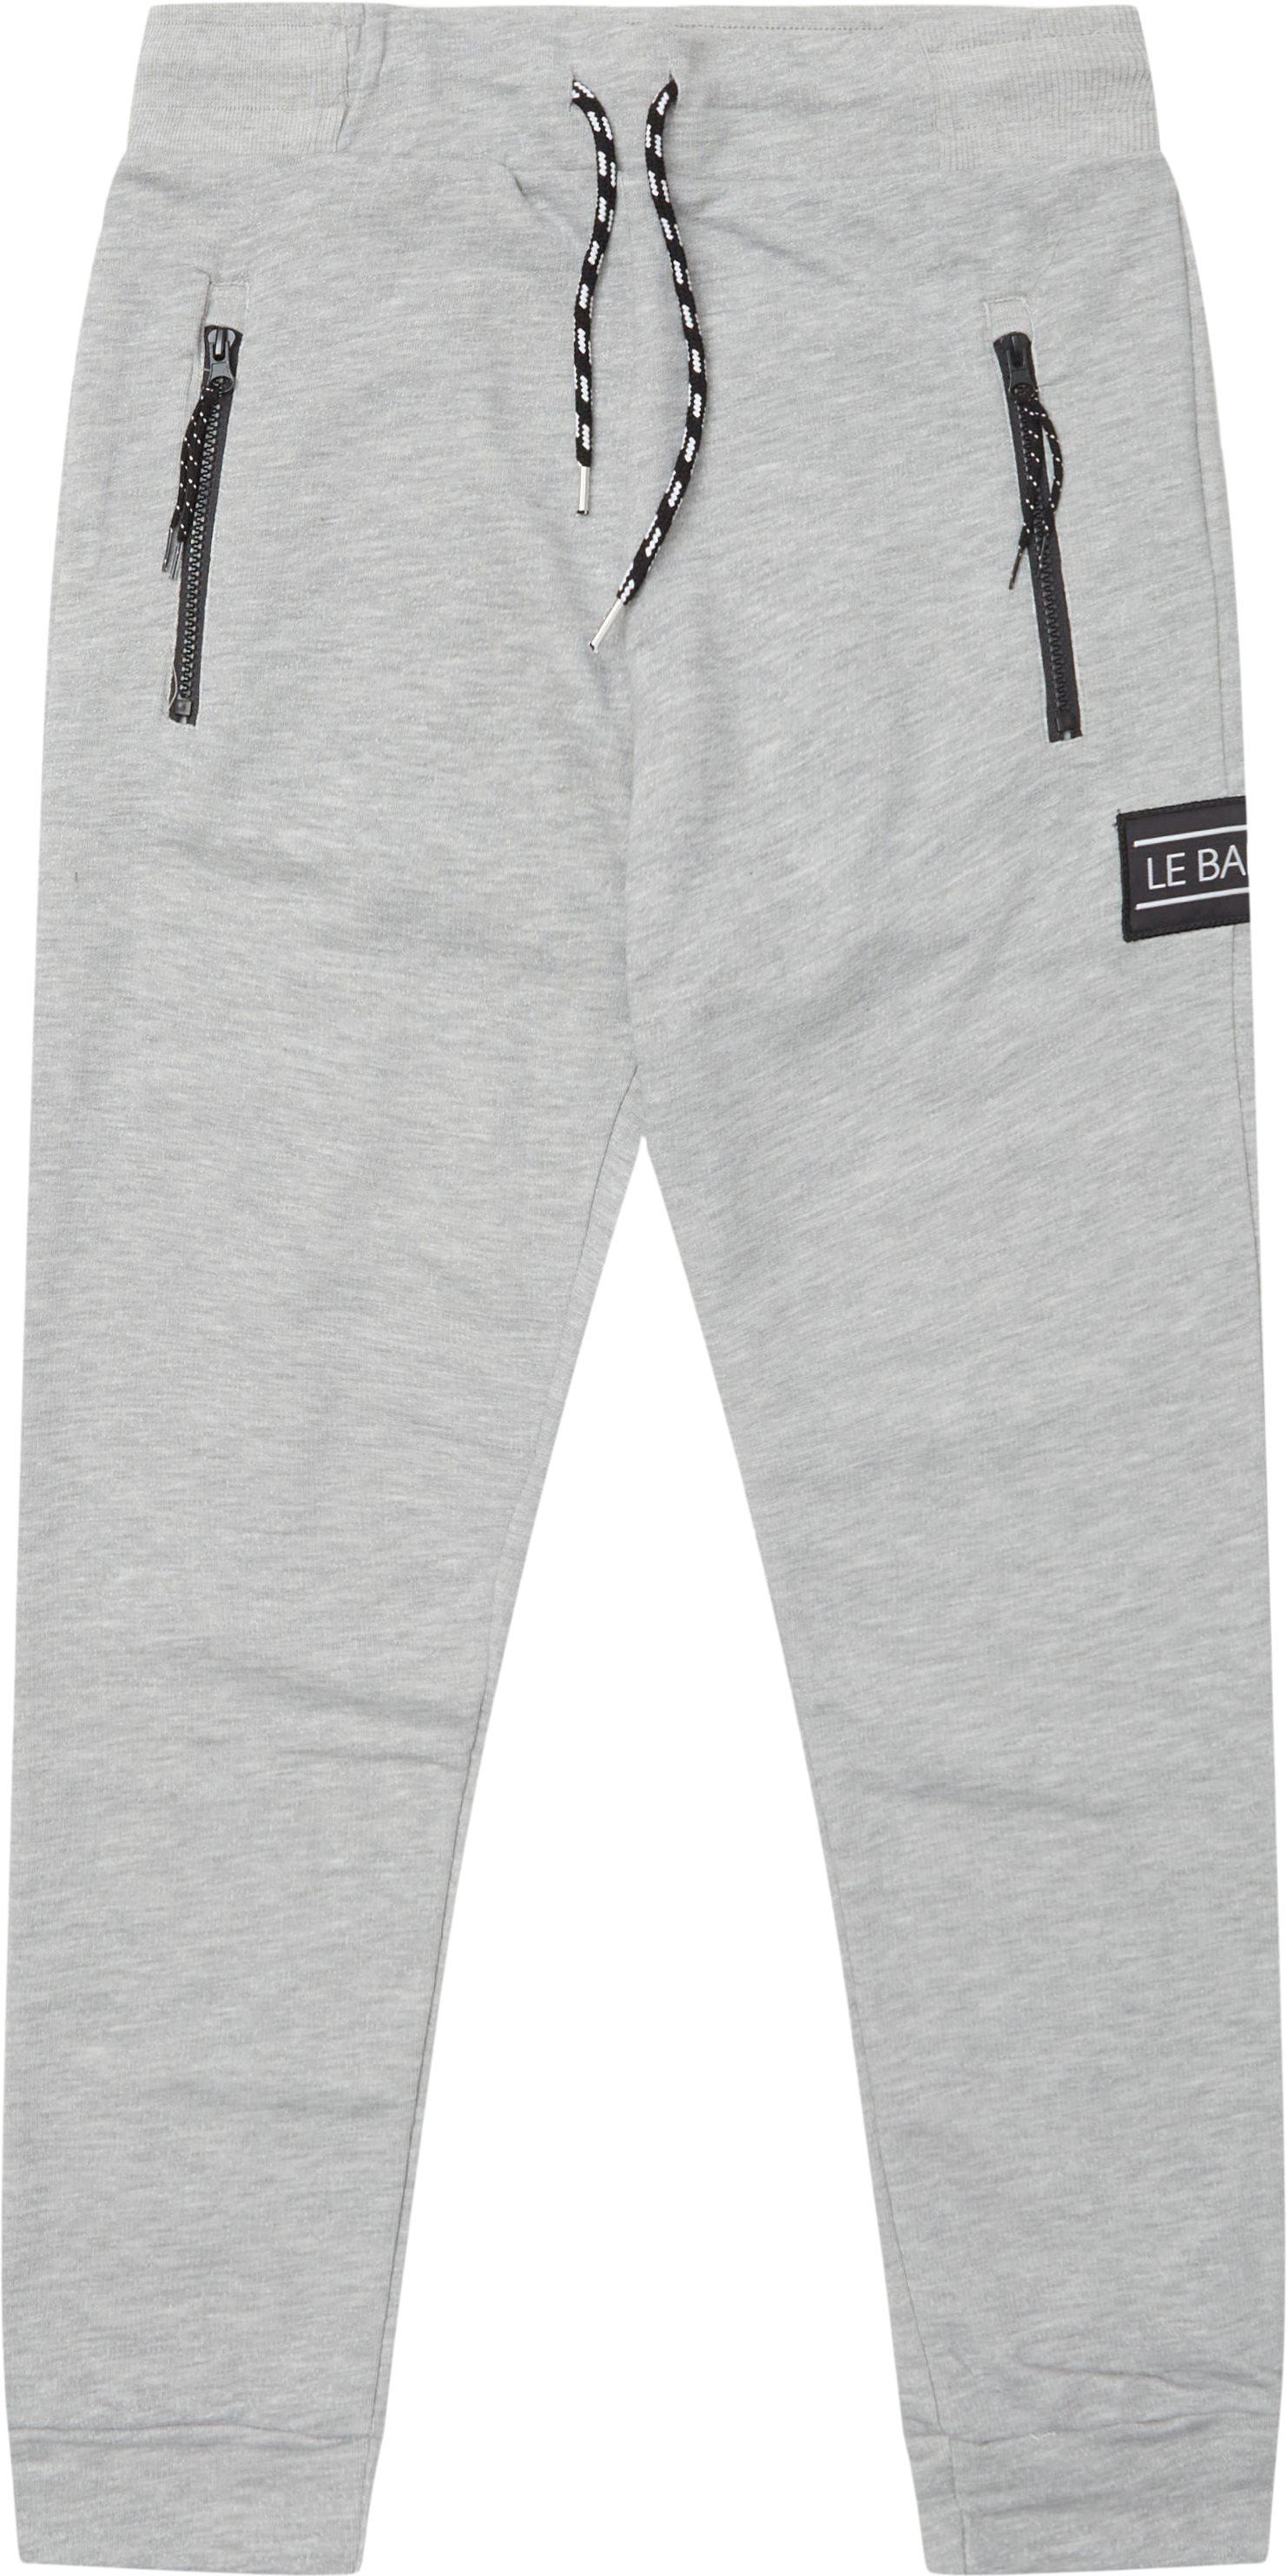 Haute Sweatpant - Bukser - Tapered fit - Grå